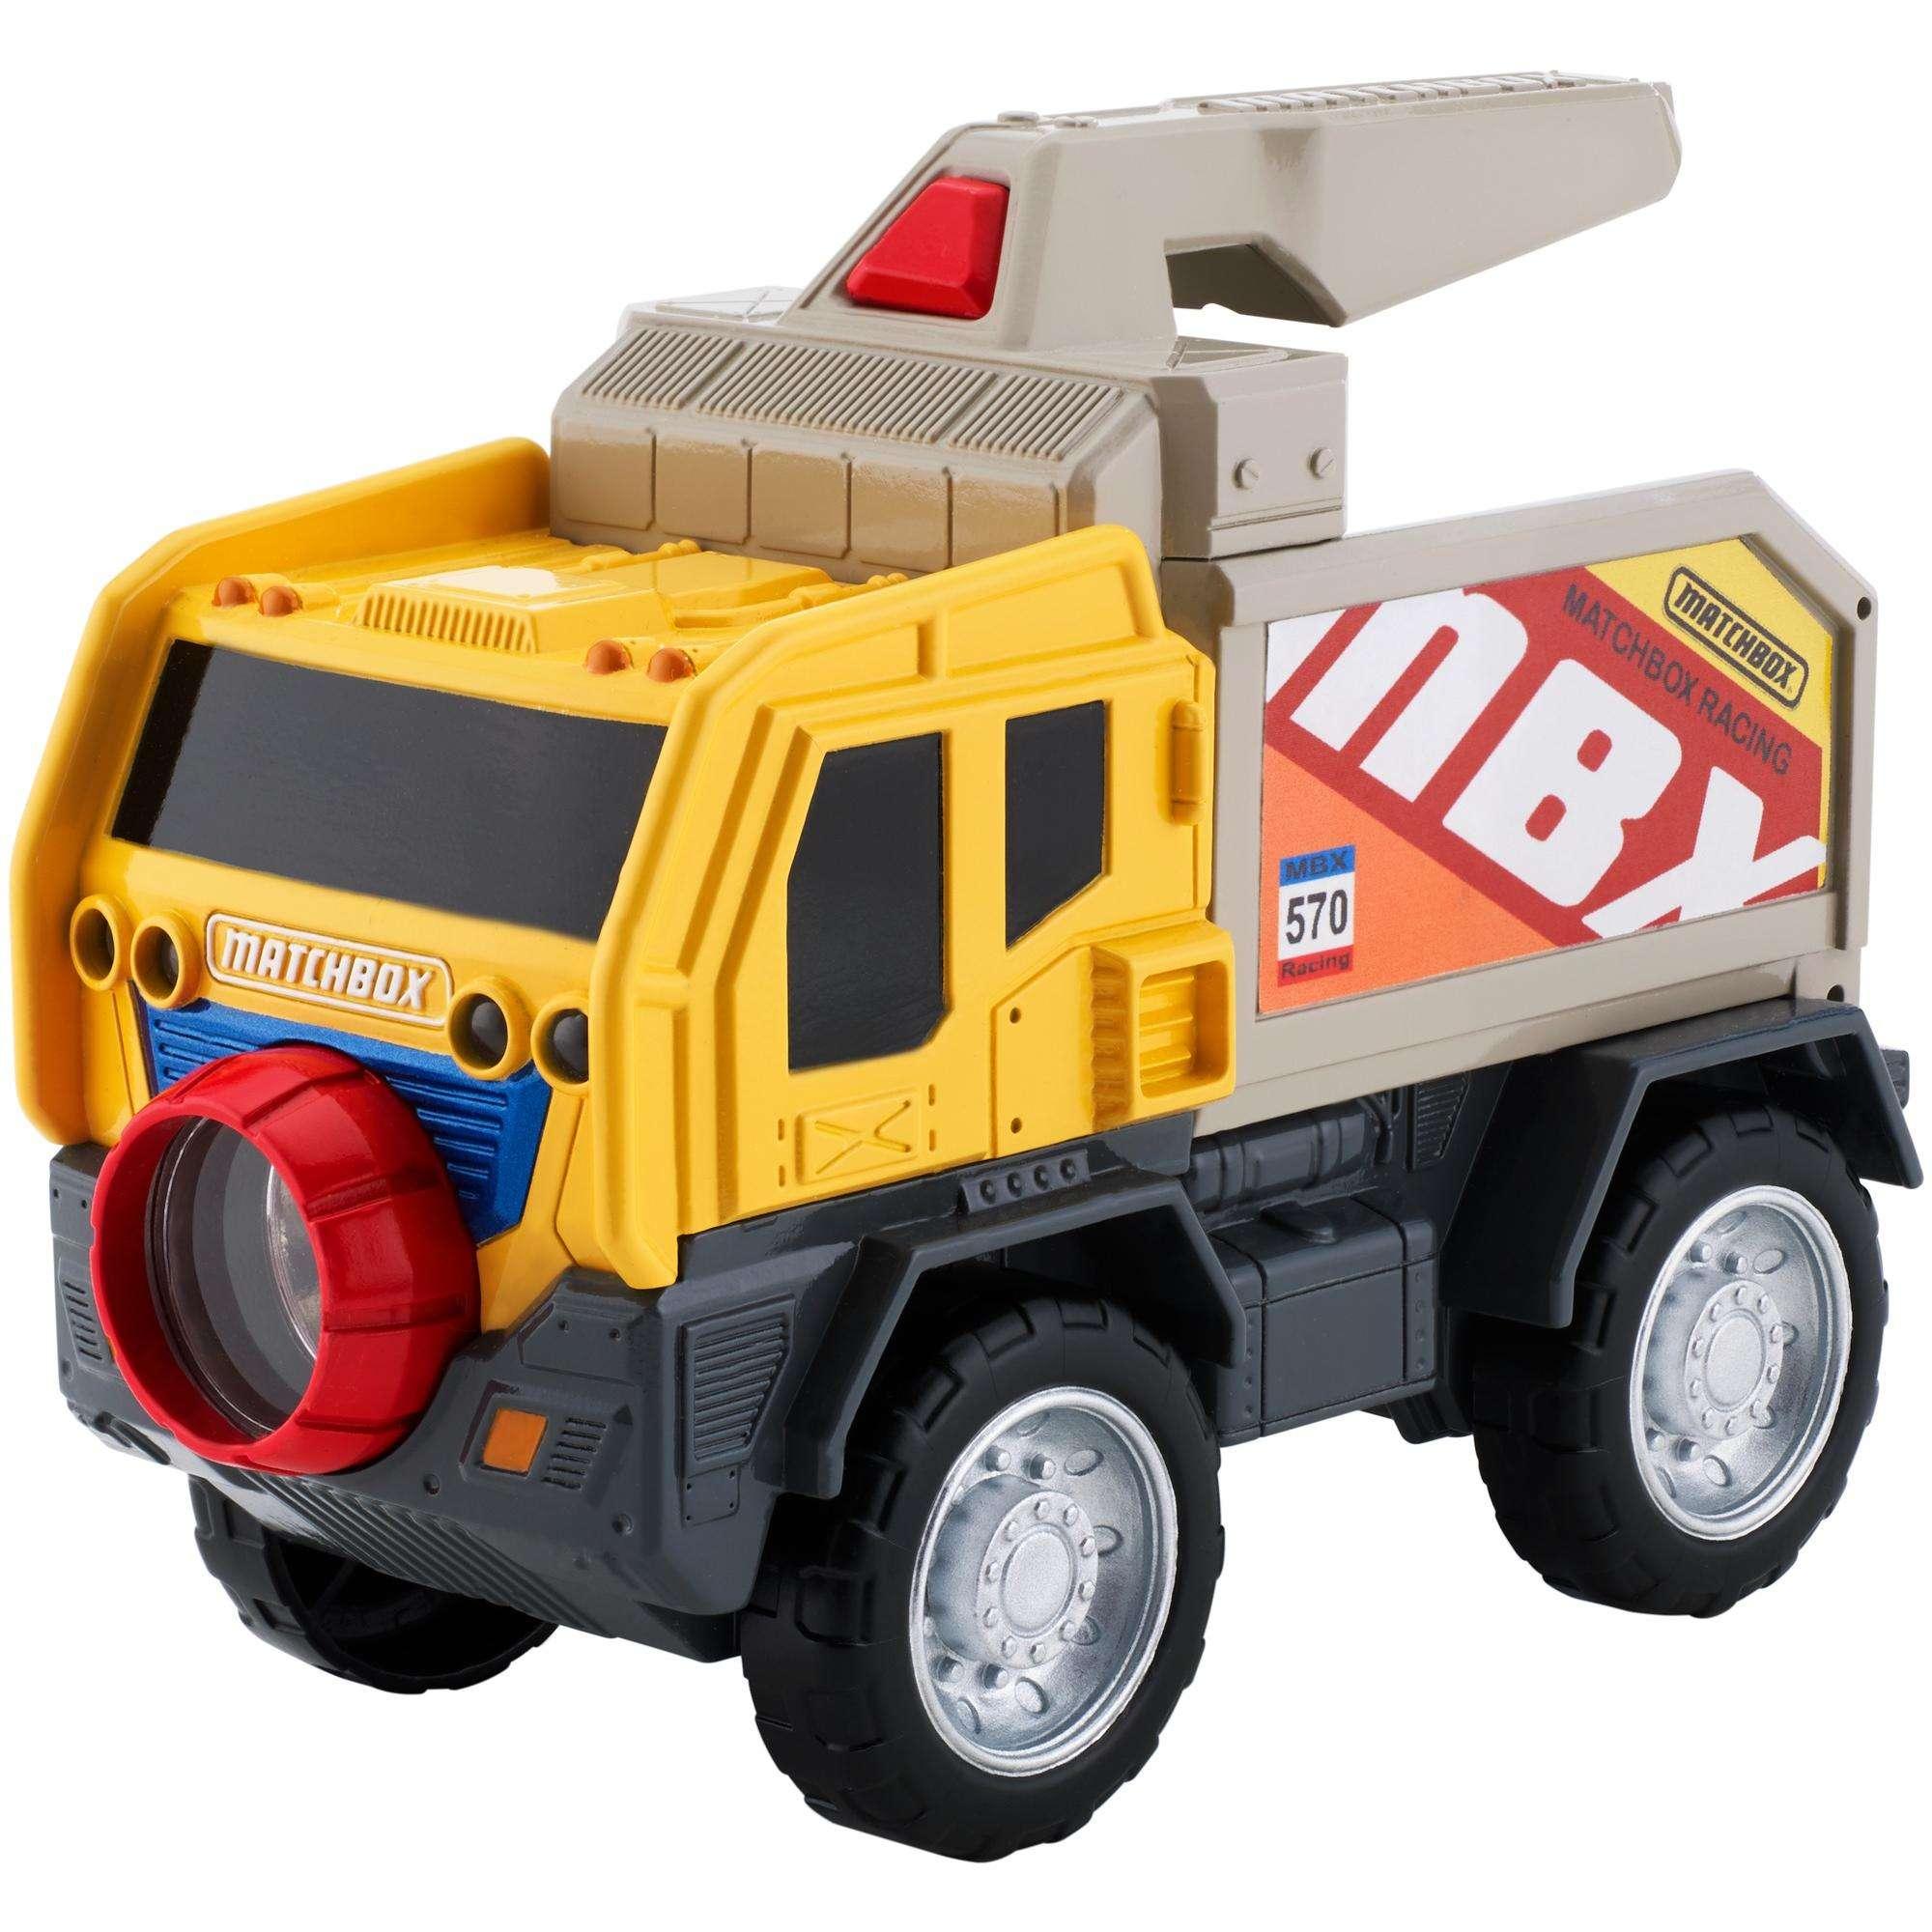 Matchbox Rally Truck Flashlight by Mattel